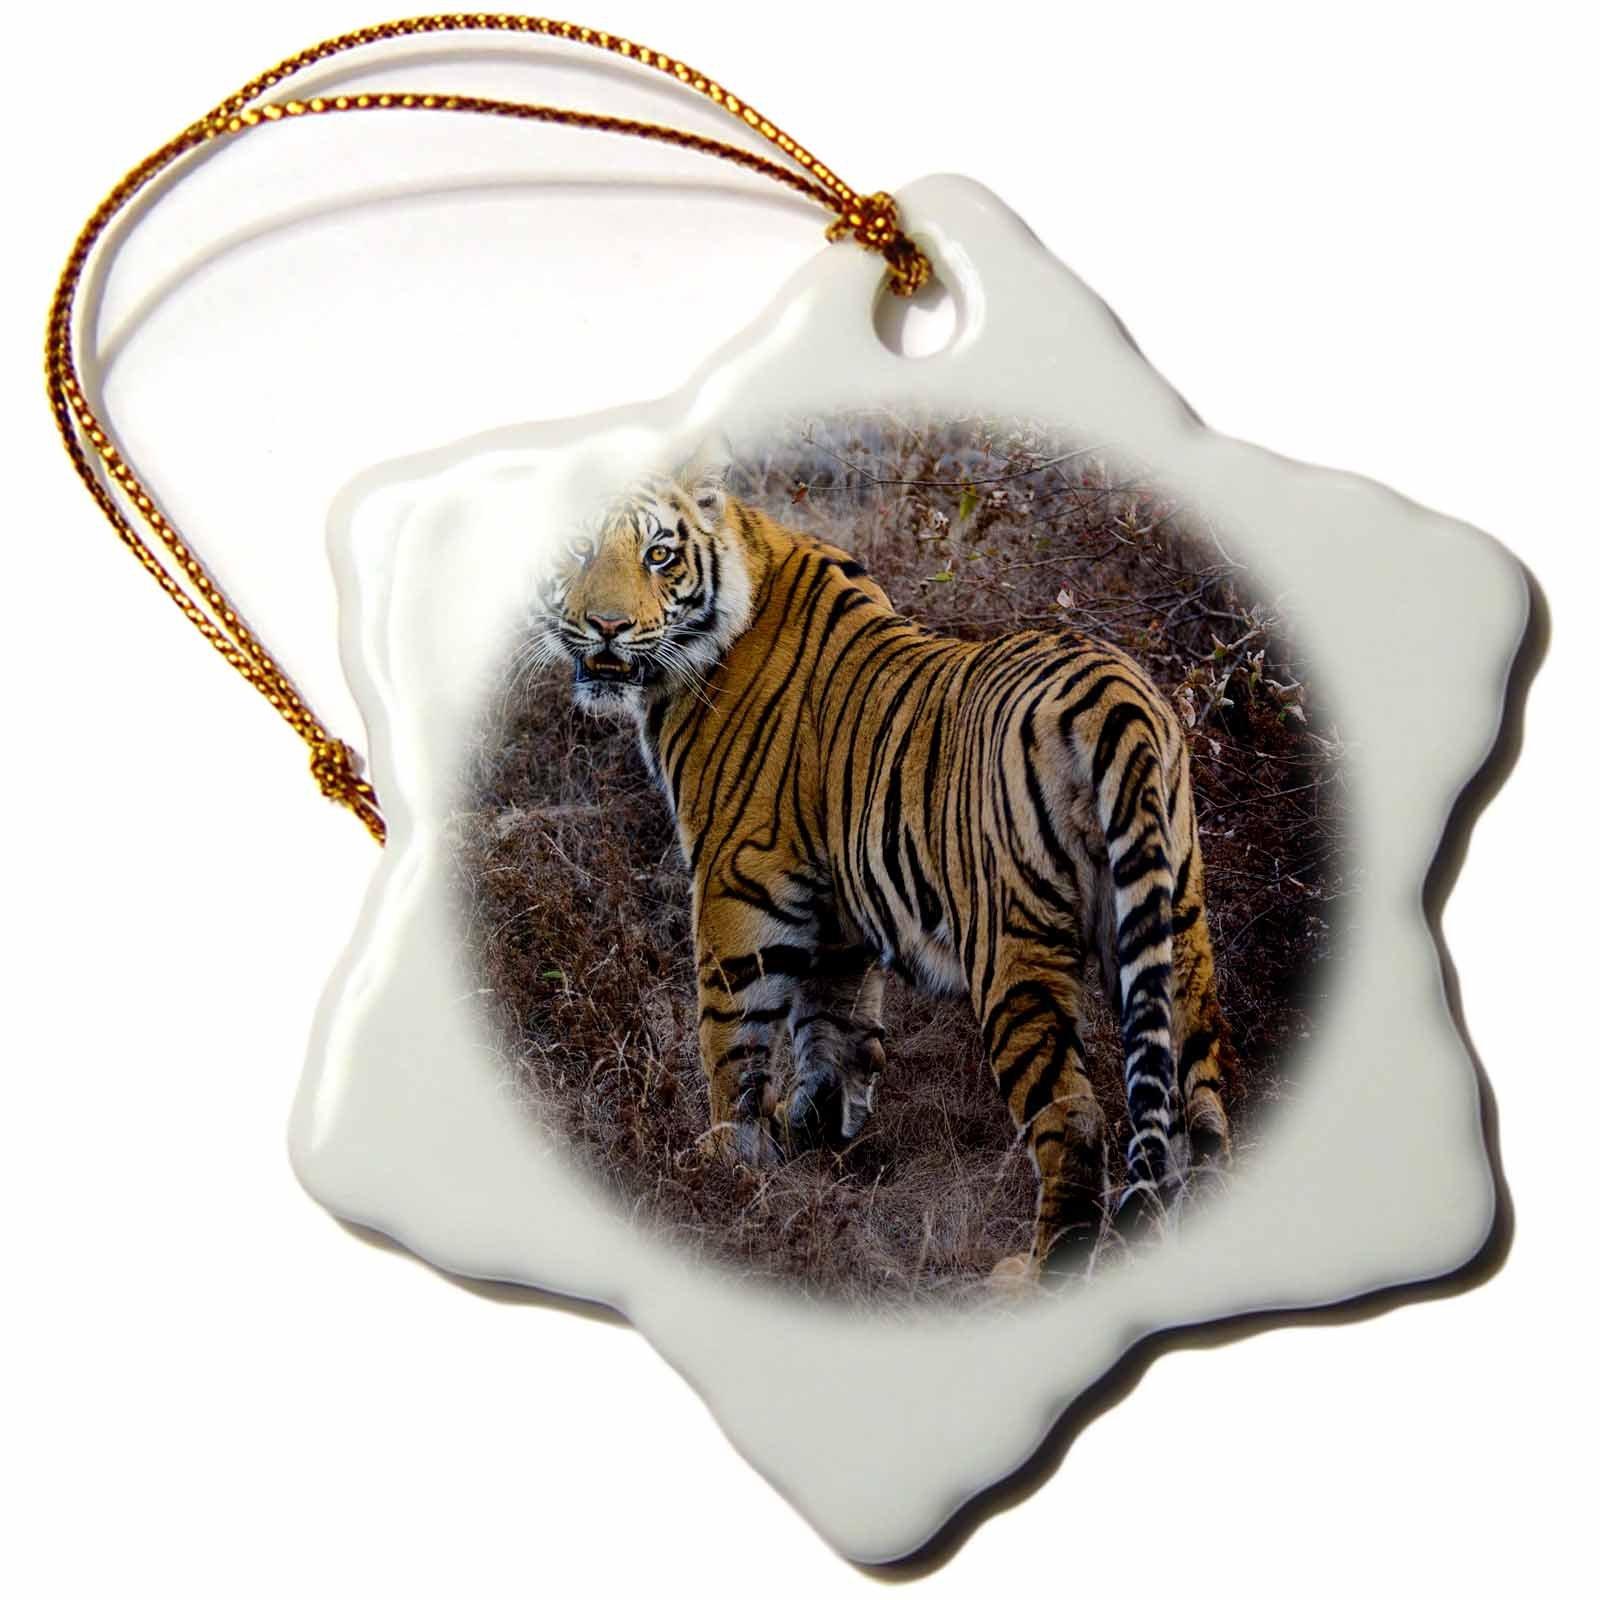 3dRose Danita Delimont - Big Cats - Tiger, Bandhavgarh National Park, India - 3 inch Snowflake Porcelain Ornament (orn_276772_1)